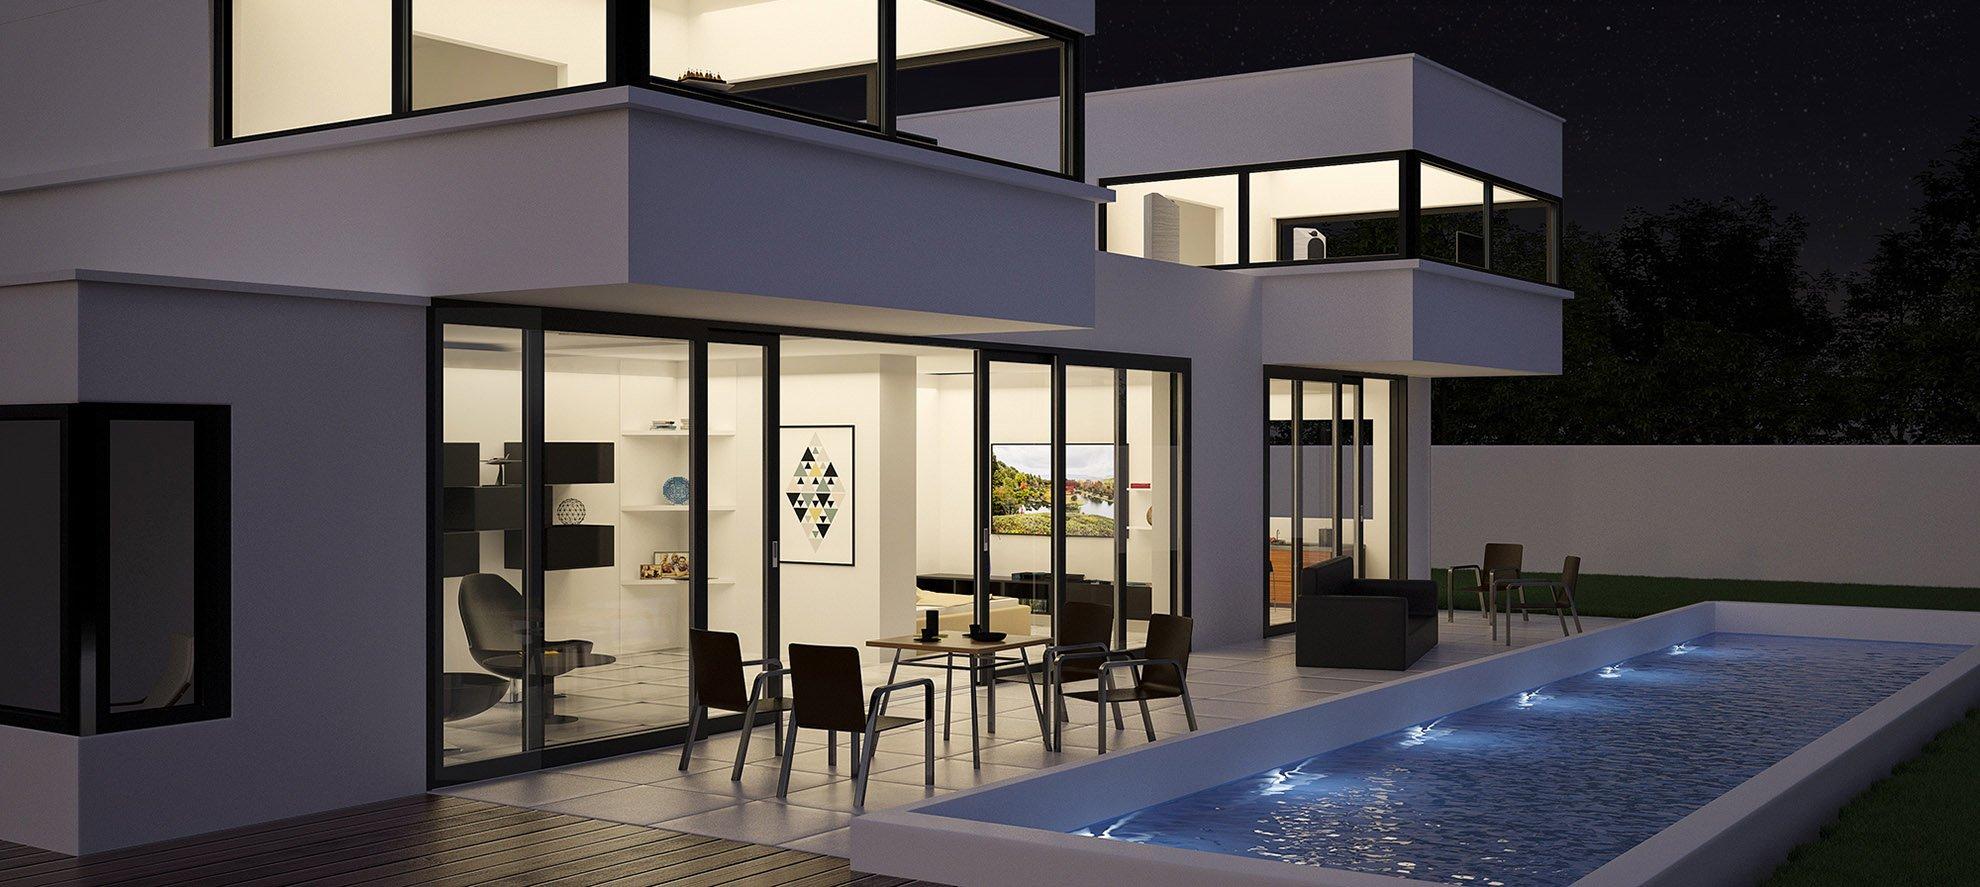 drutex s a hebe schiebe hs iglo hs. Black Bedroom Furniture Sets. Home Design Ideas